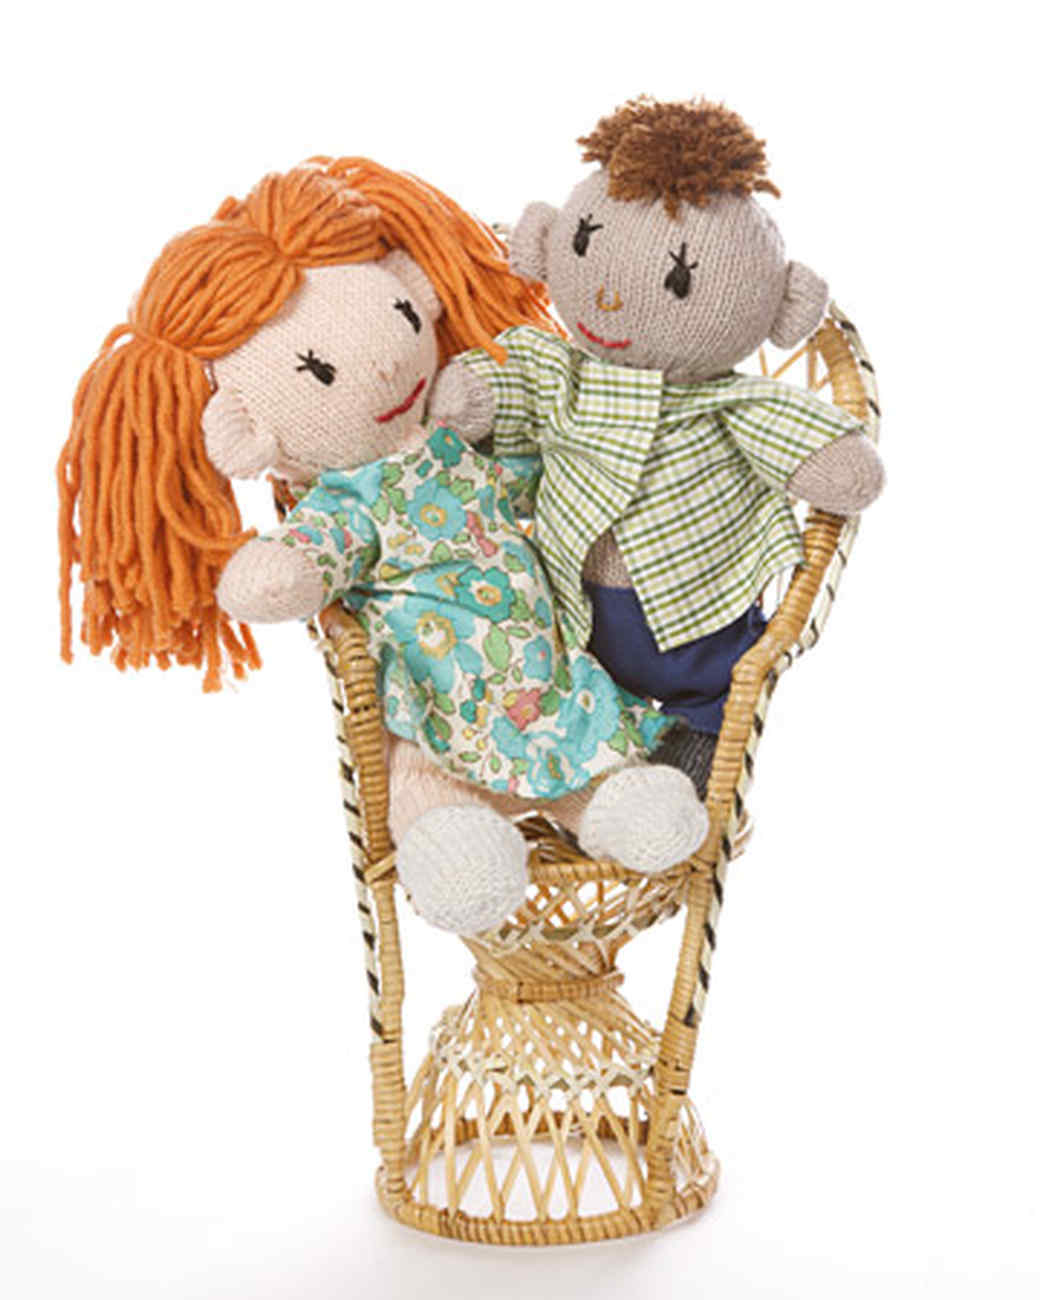 Boy and Girl Glove Dolls